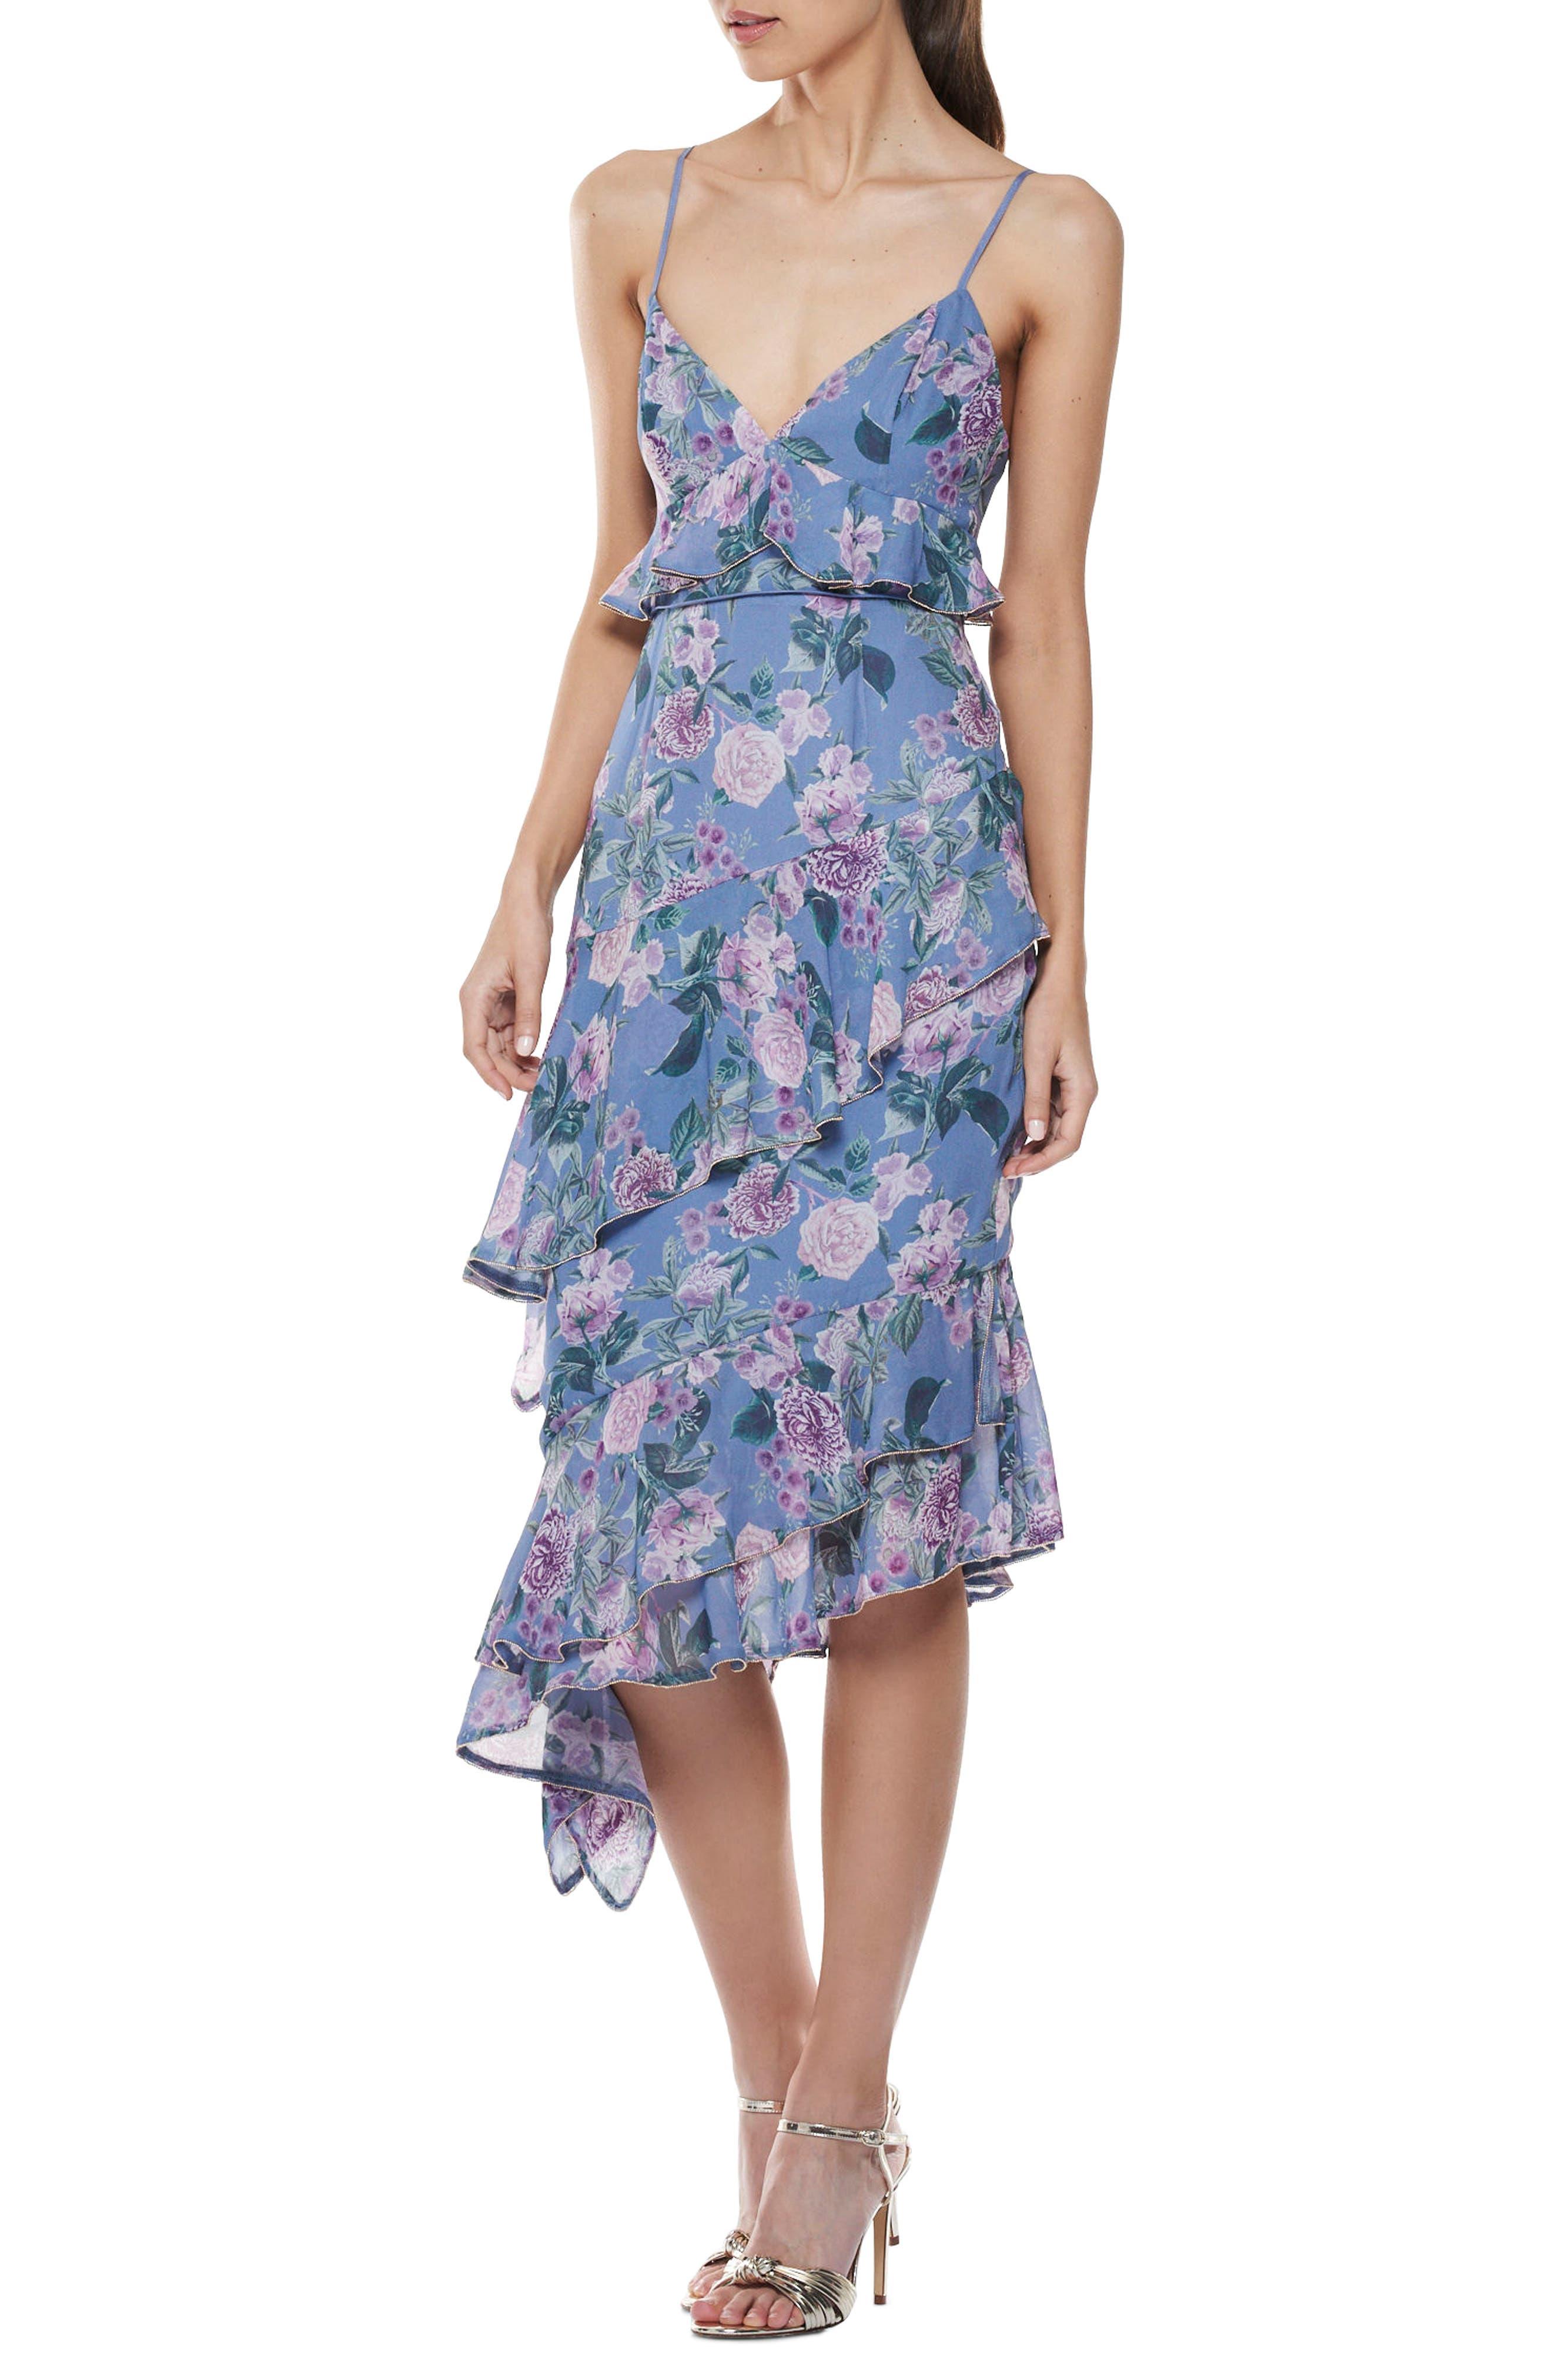 Here & Now Asymmetric Midi Dress,                             Main thumbnail 1, color,                             Print